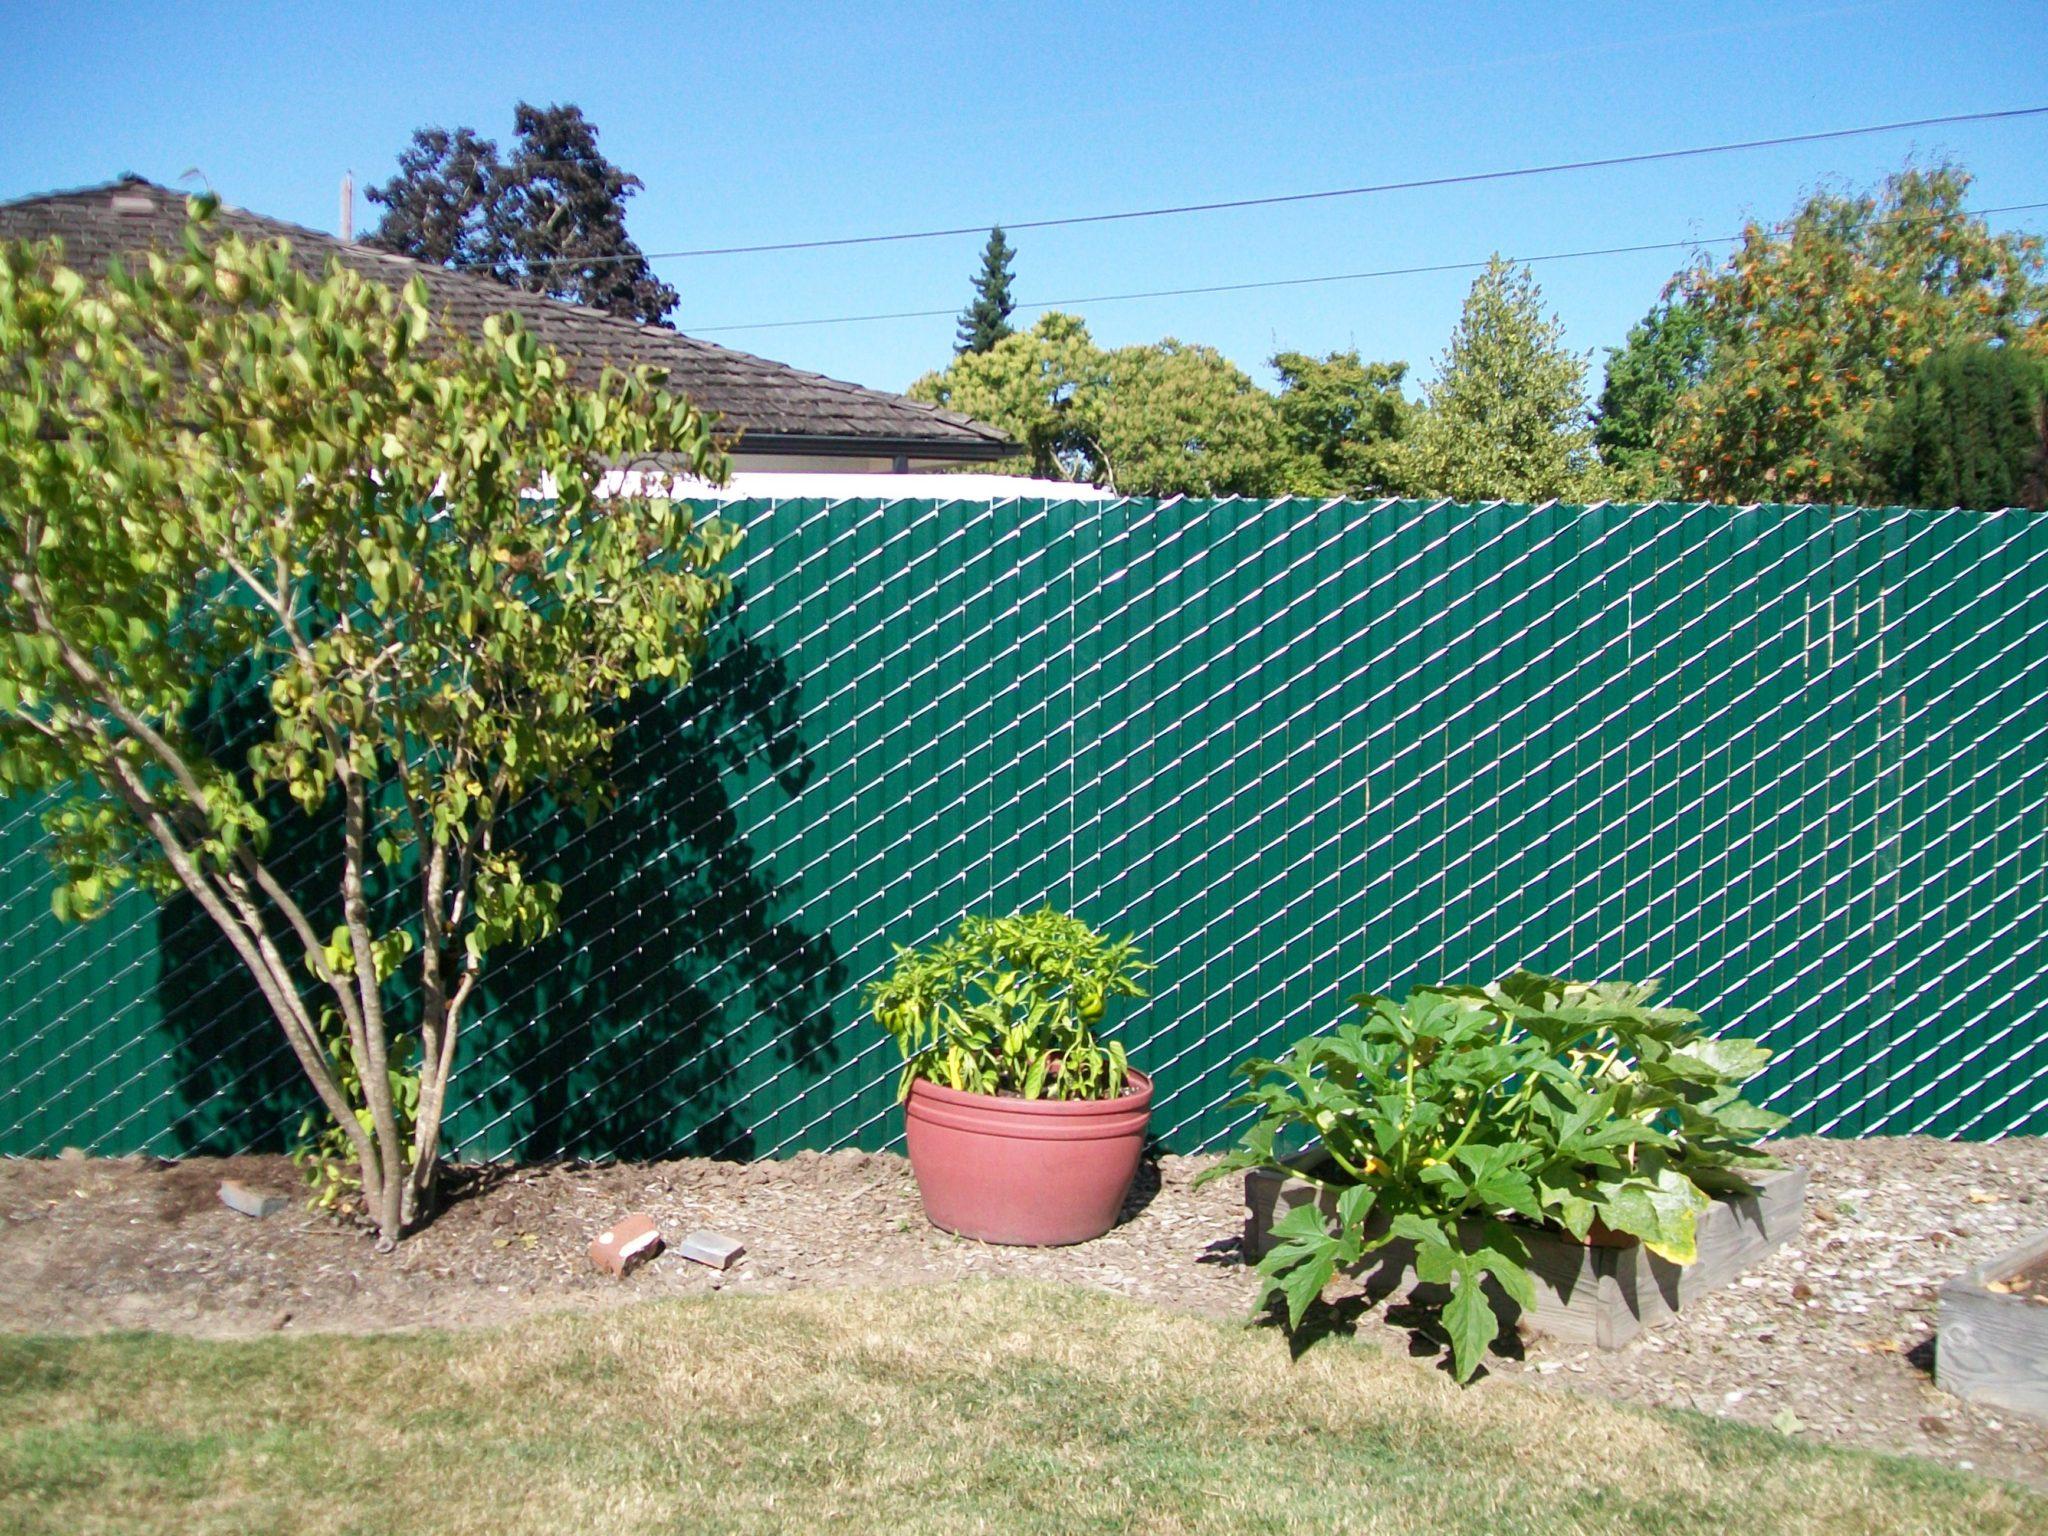 215 Pre Slat 95 Privacy Chain Link Fence Salem Oregon Outdoor Fence